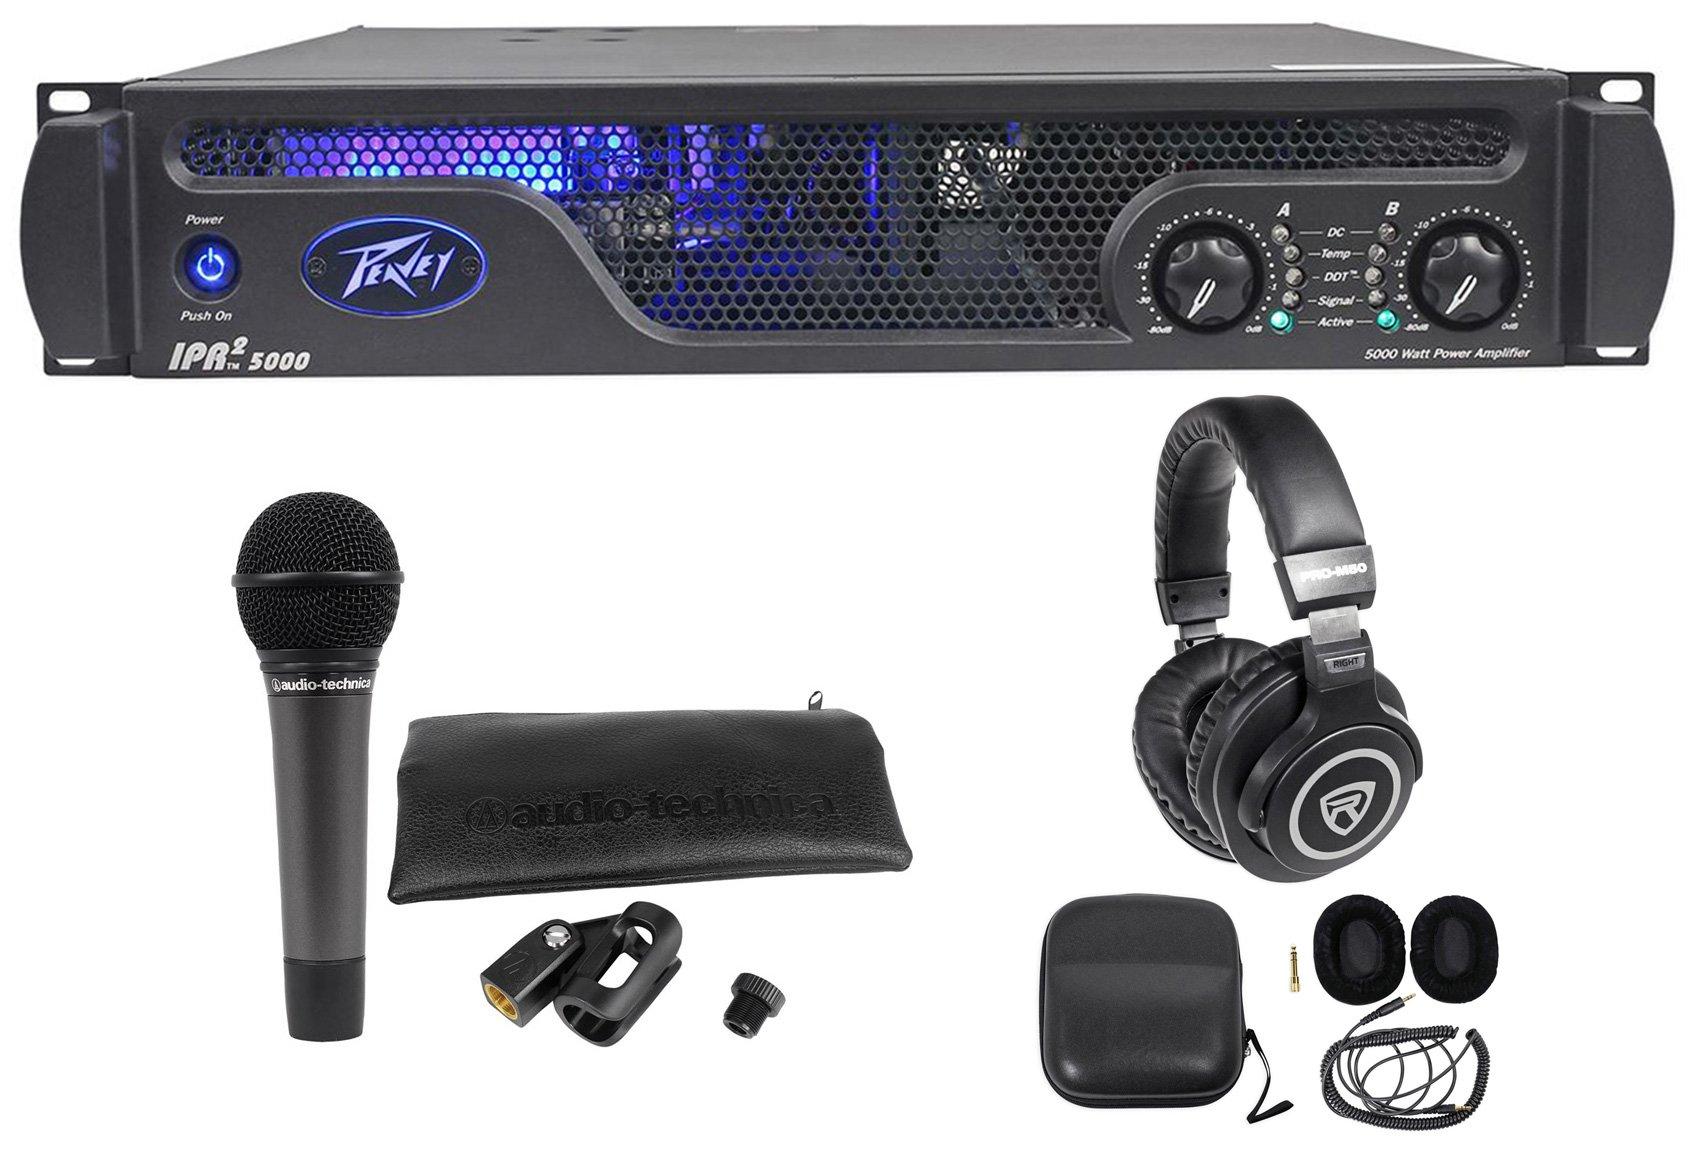 Package: Peavey IPR2 5000 5,050 Watt RMS Professional Power Amplifier + Audio Technica ATM510 Cardioid Dynamic Handheld Microphone + Audio Technica ATH-M20x Closed-Back Studio Monitor Headphones